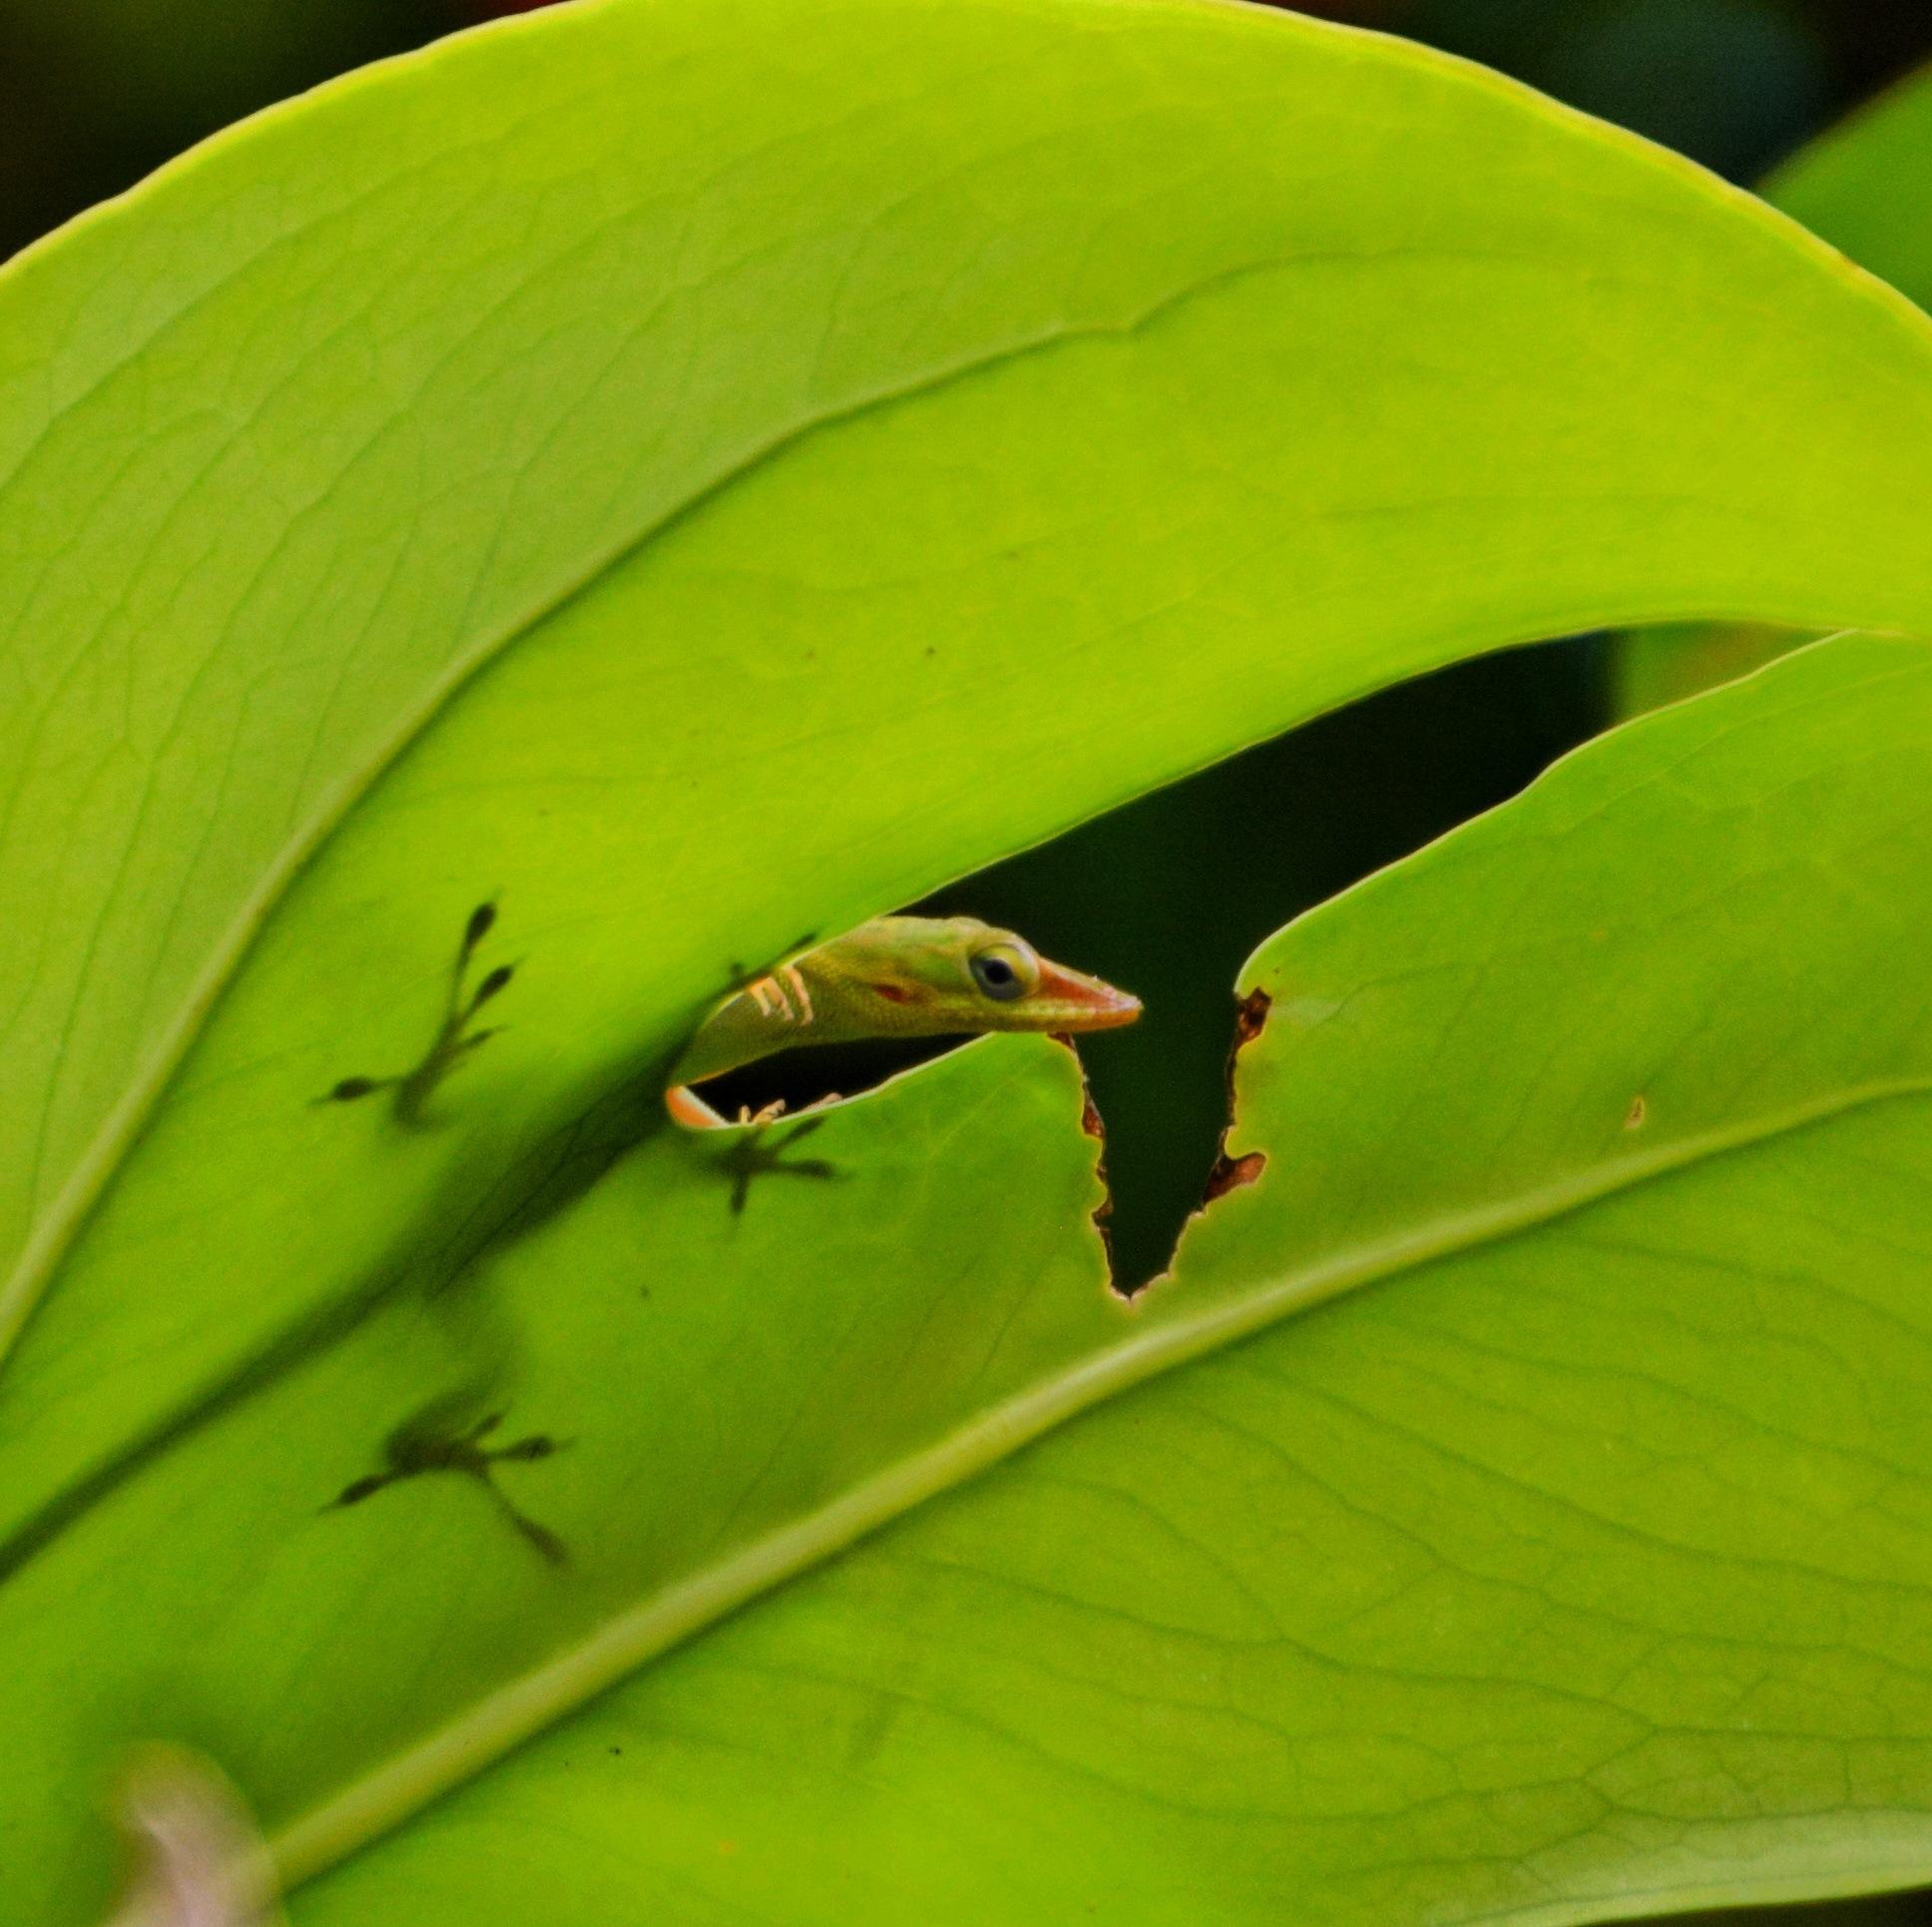 Lizard looking through leaf by Kevin Rausch